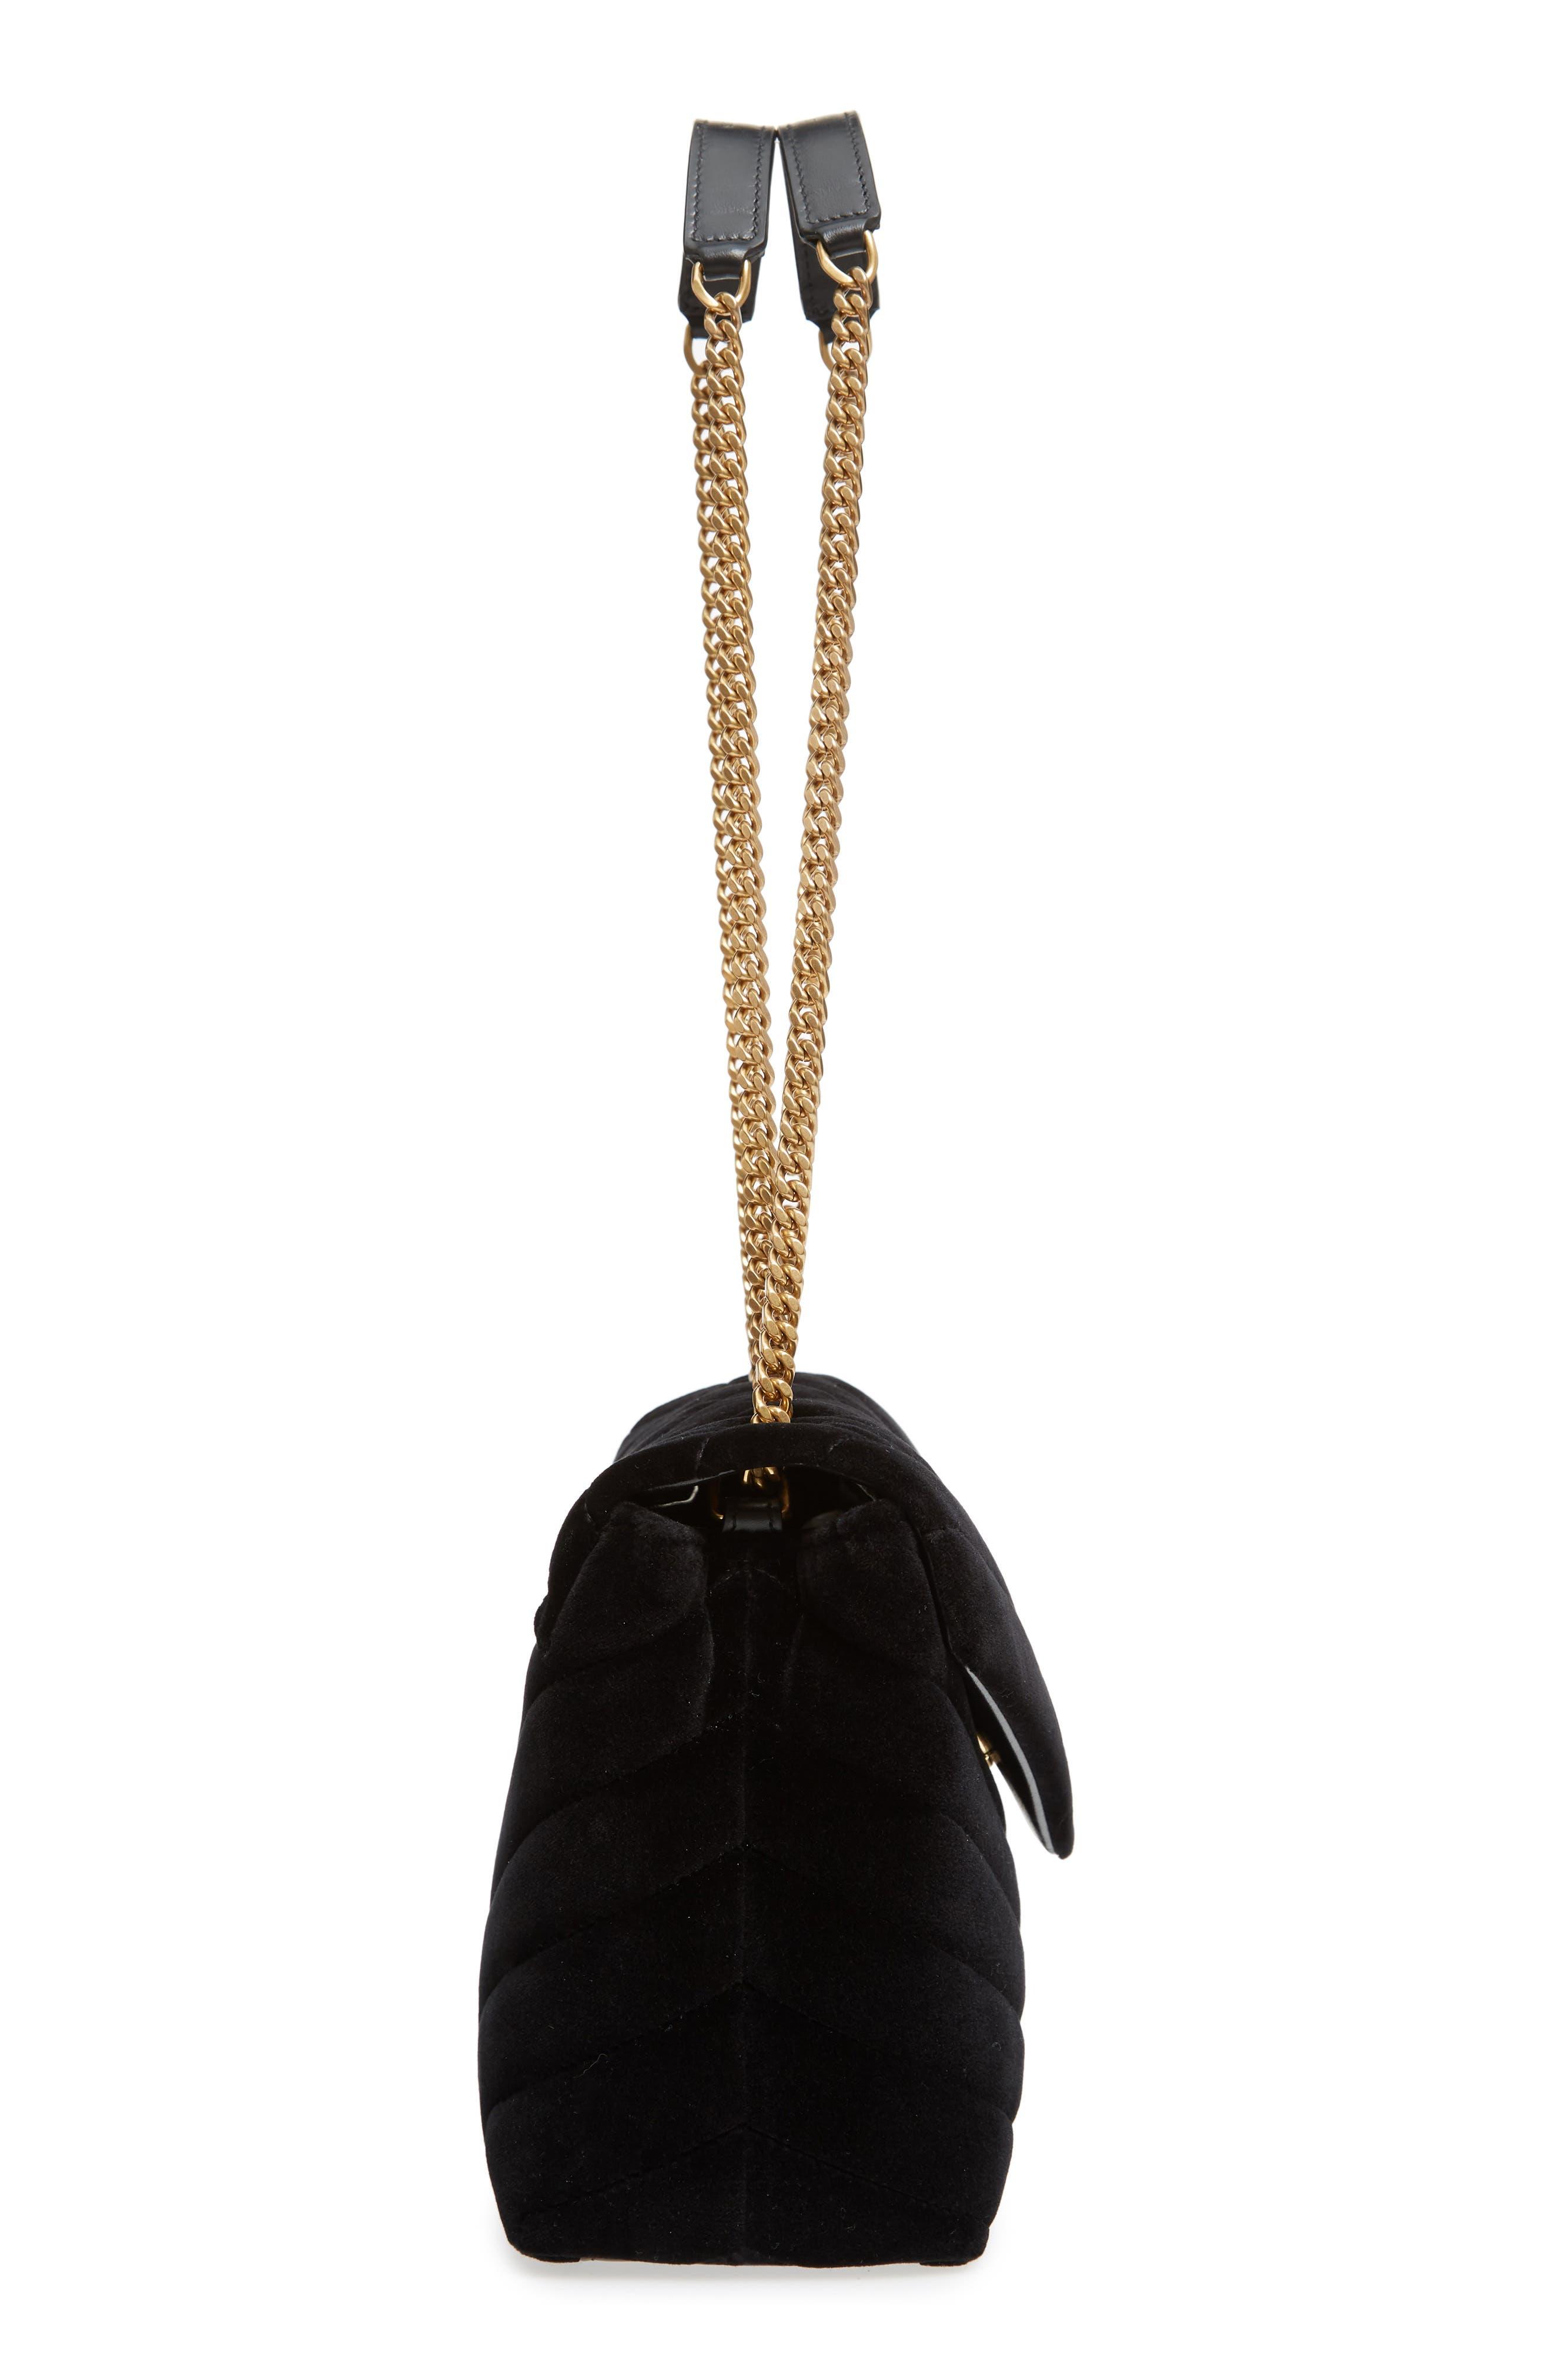 SAINT LAURENT,                             Small Loulou Velvet Shoulder Bag,                             Alternate thumbnail 5, color,                             NERO/ NERO/ NERO